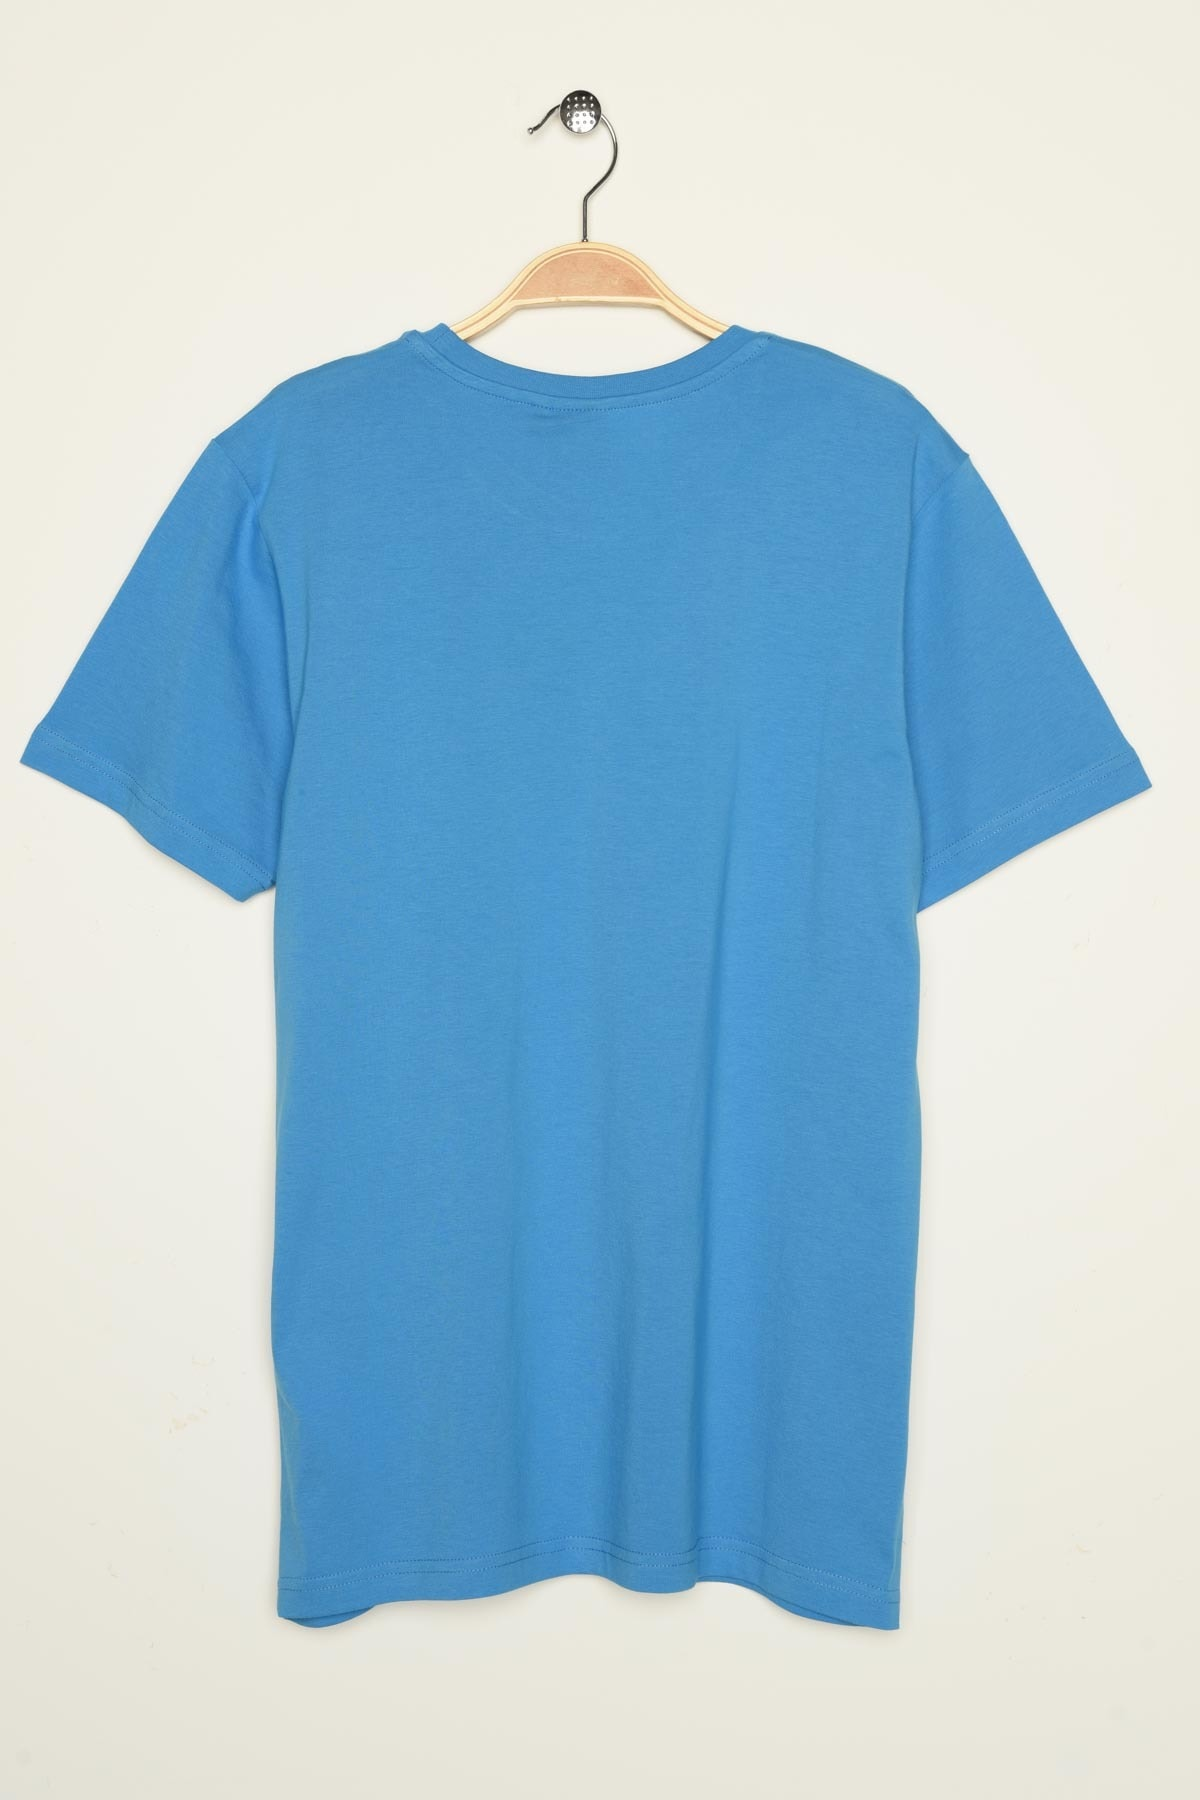 HUMMEL Erkek Spor T-Shirt - Hmlalbus T-Shirt S/S 2